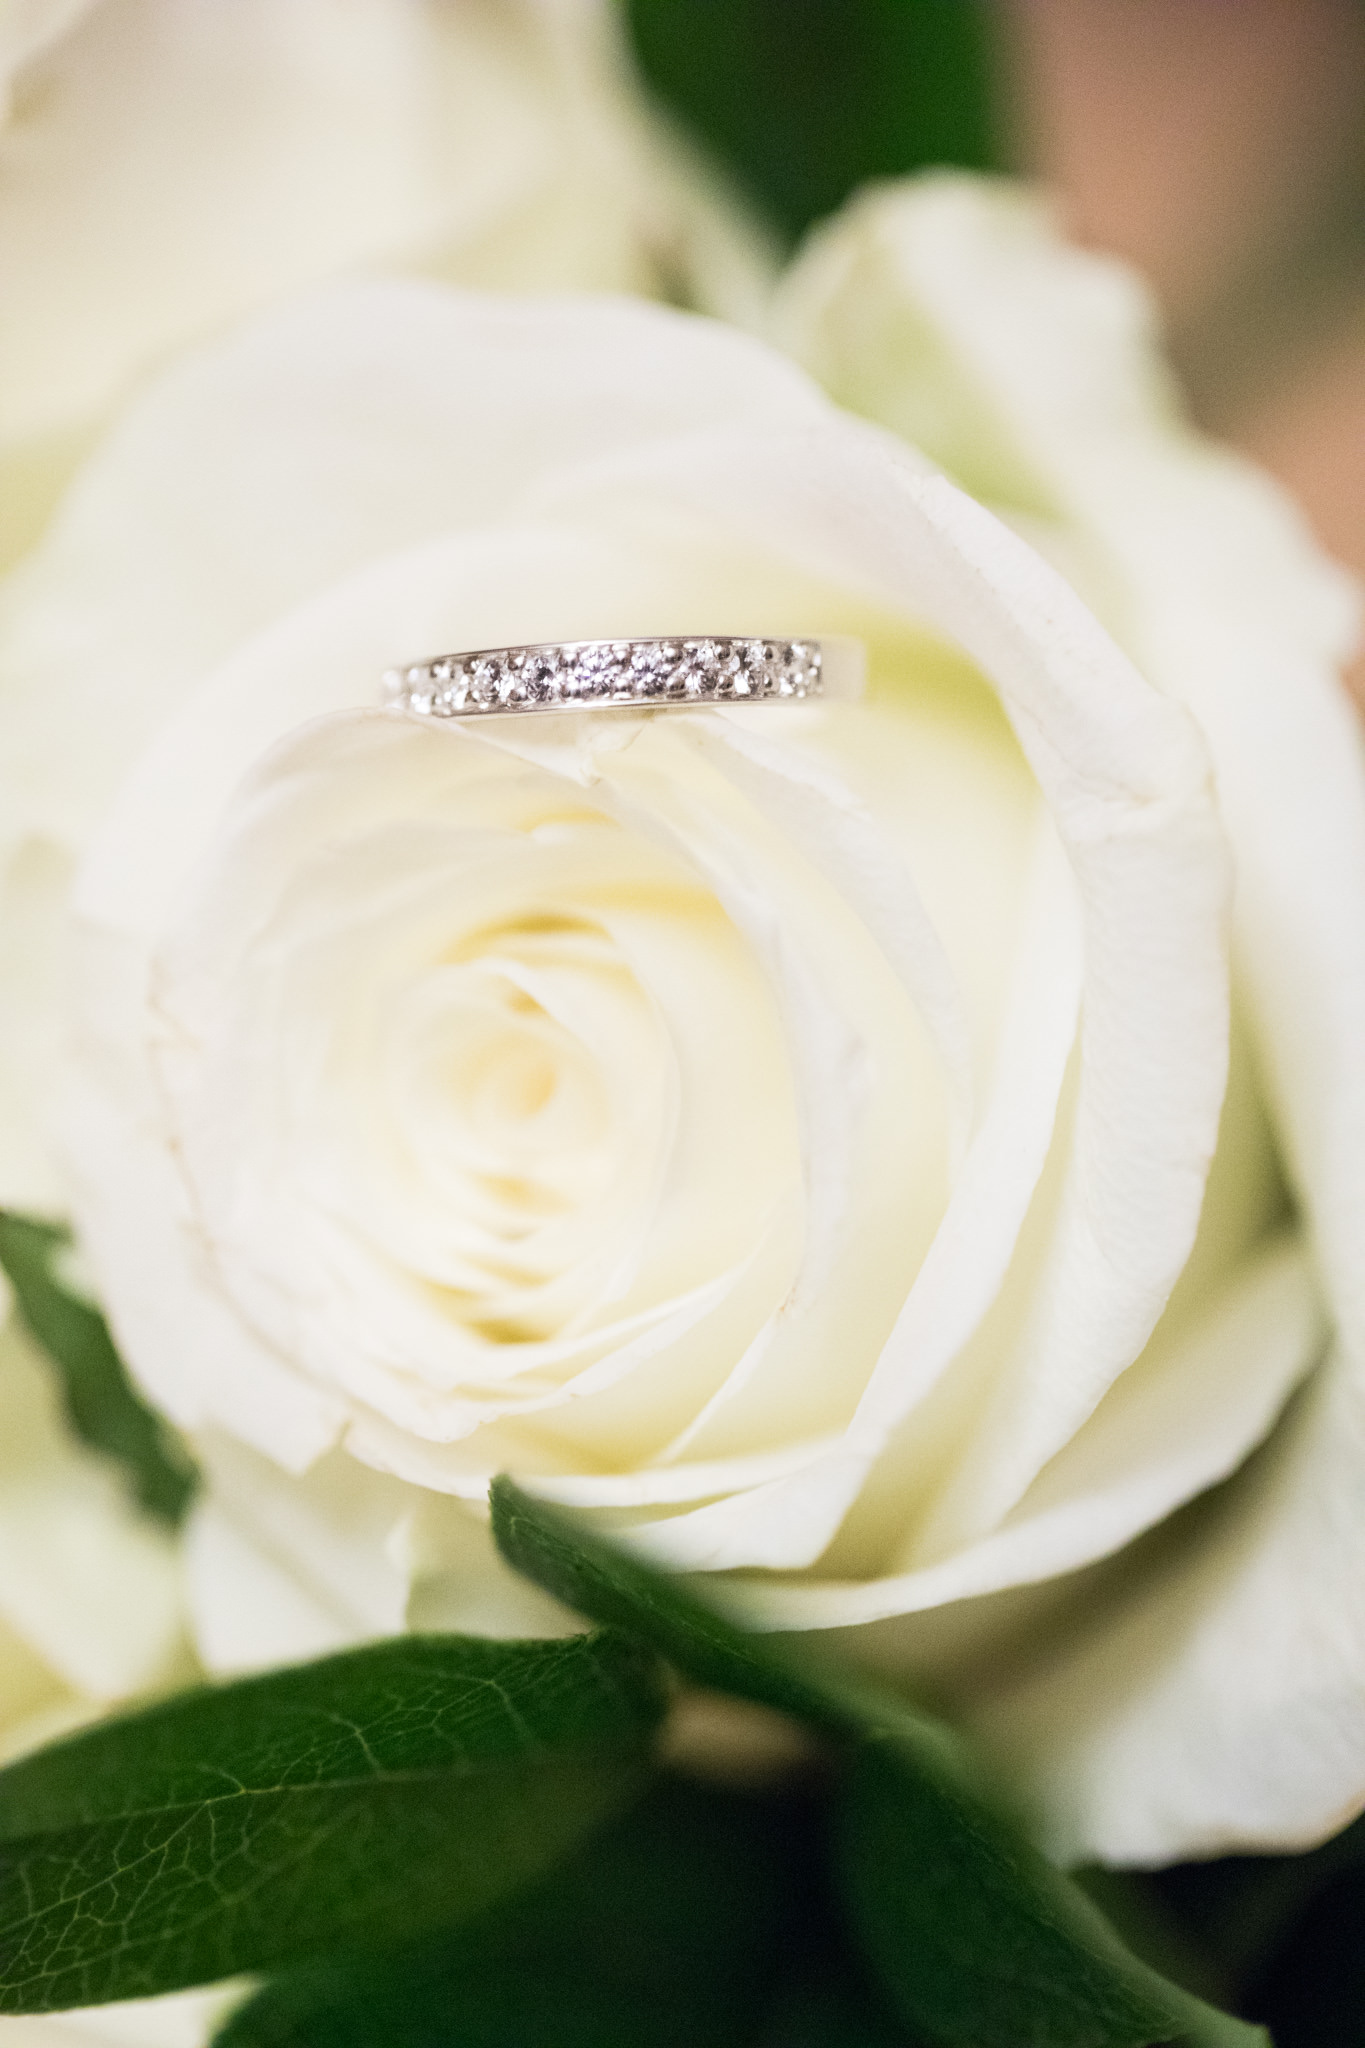 Vita rosor + ring.jpg